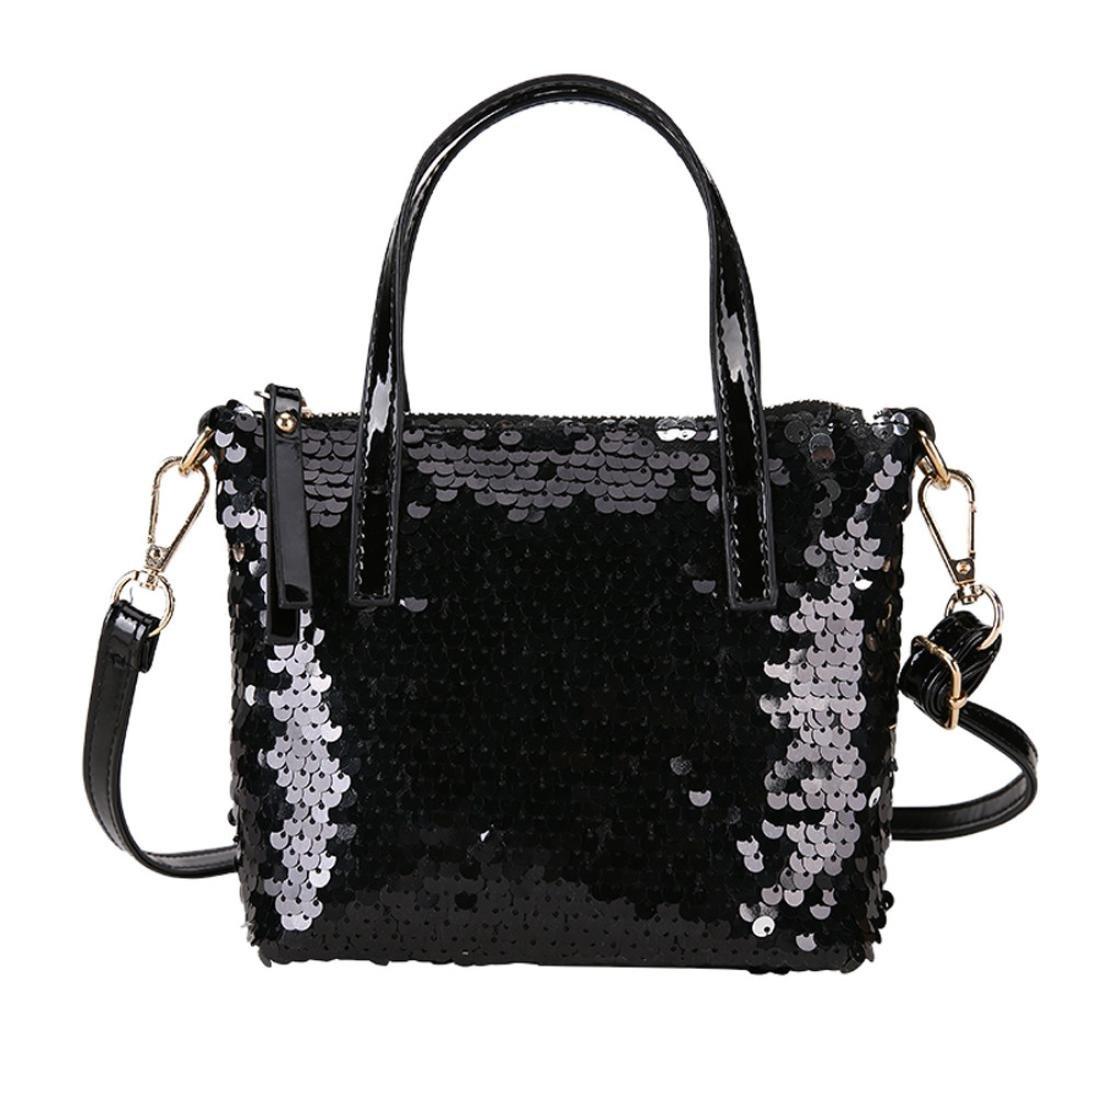 Fashion Women Sequins Chain Small Crossbody Bag Phone Bag